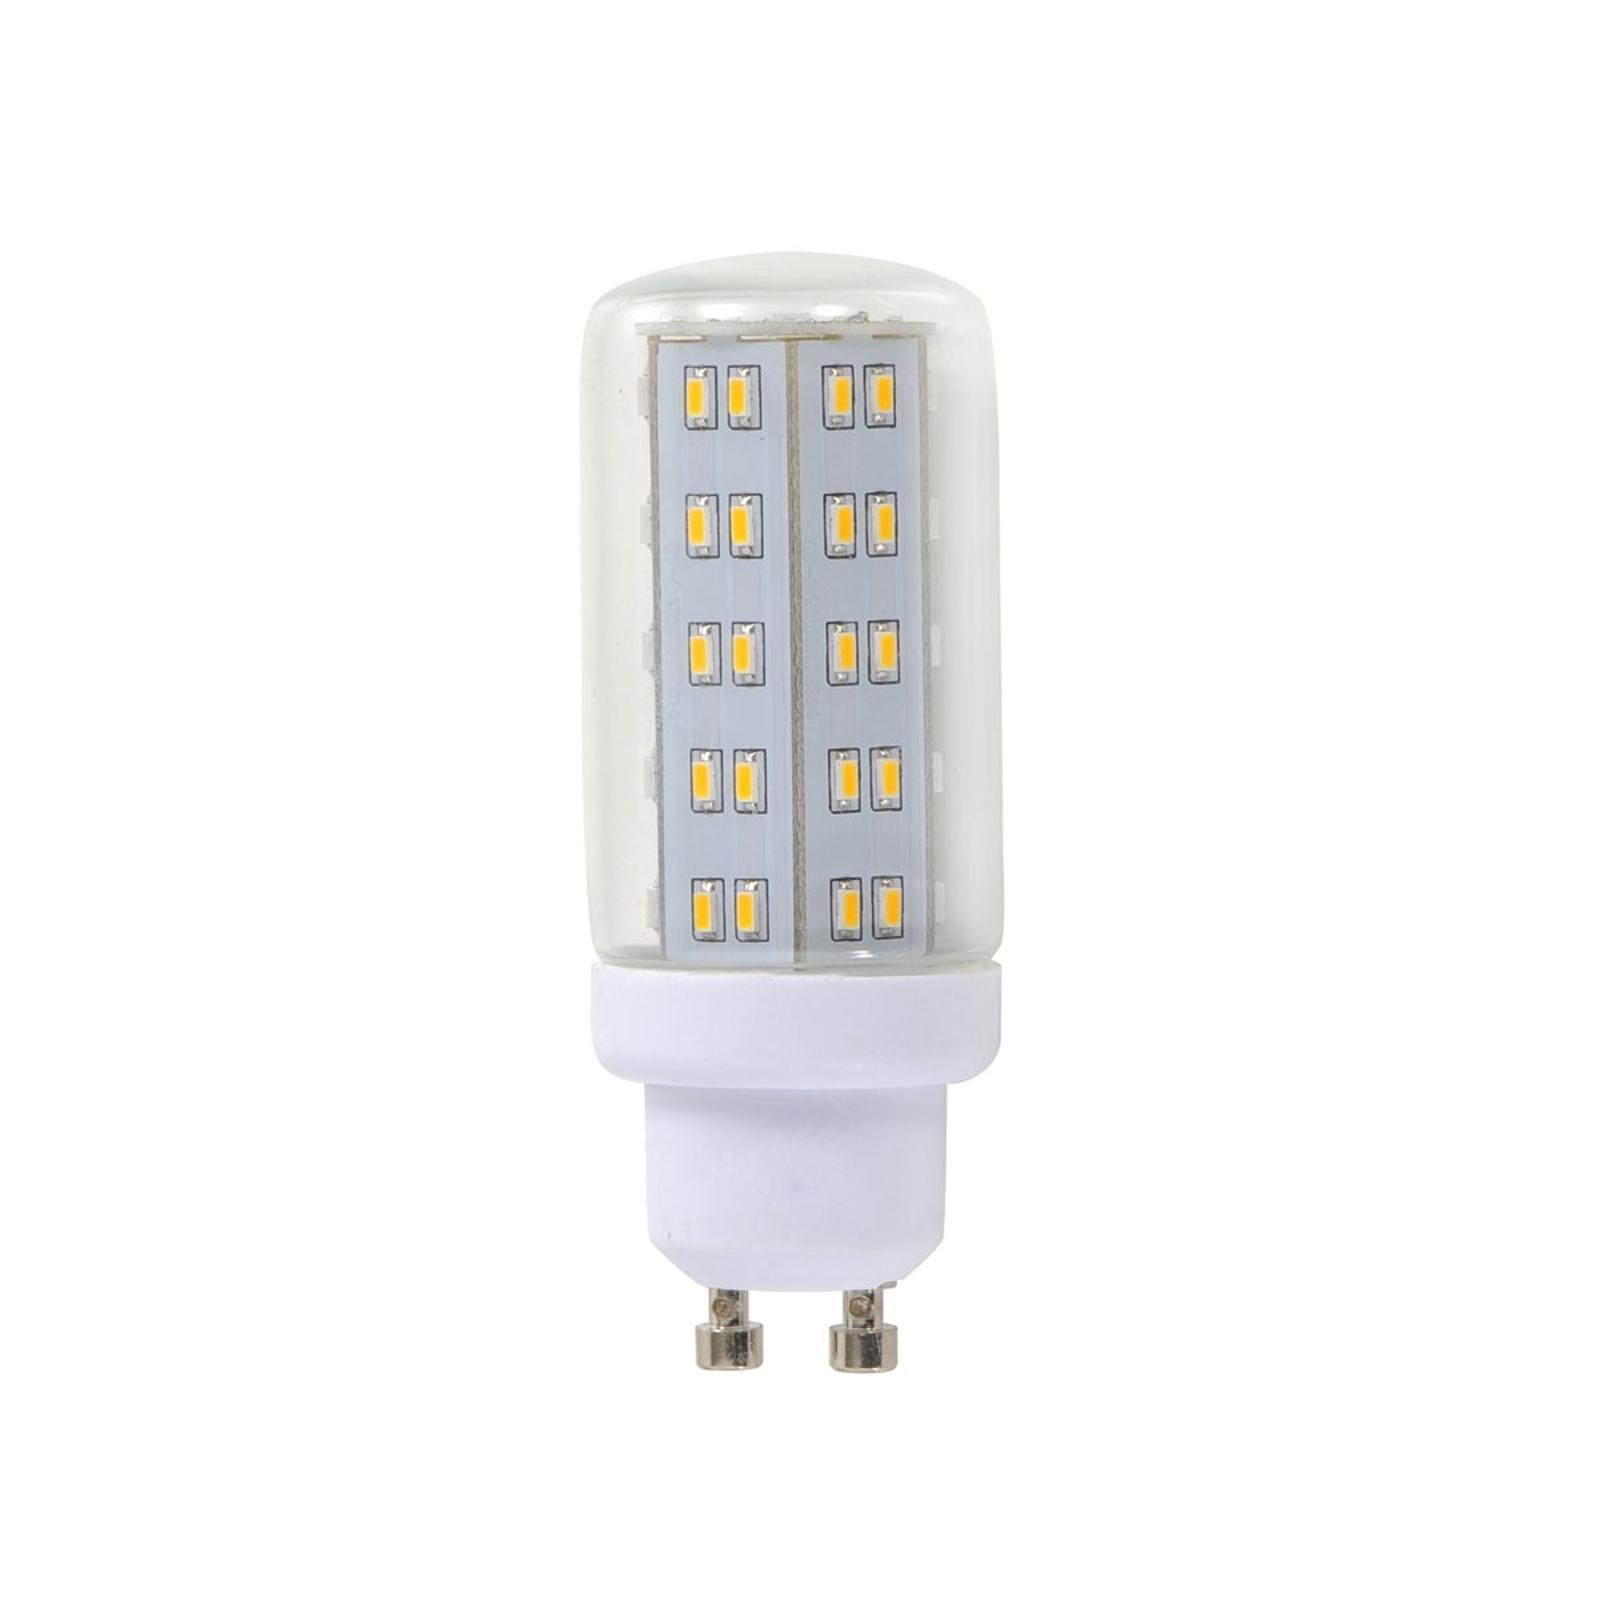 E27 4W LED-pære i rørform klar med 69 LEDs